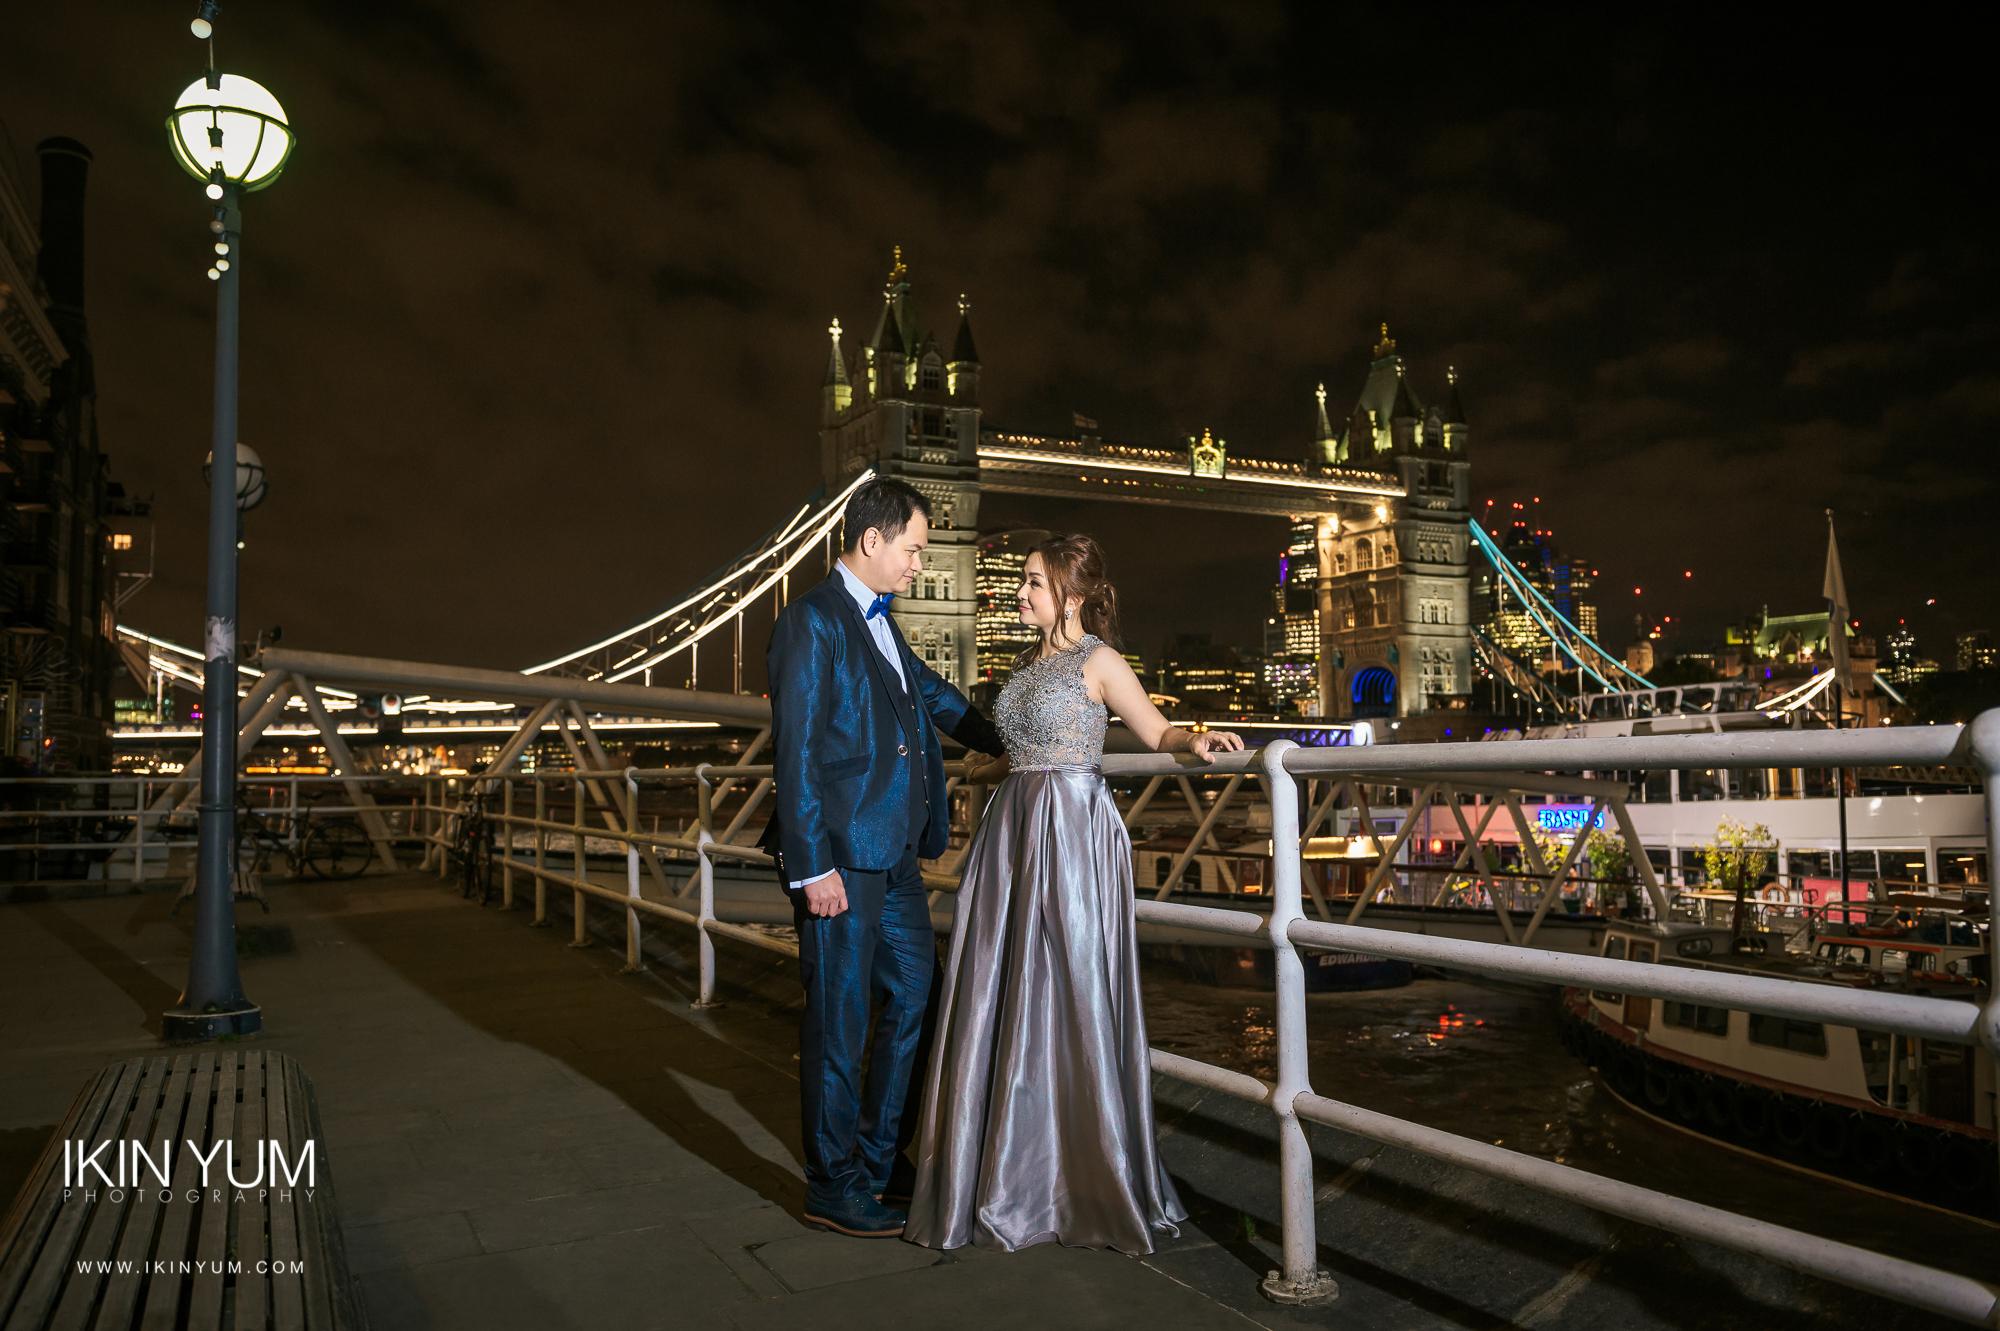 Katie & Steven Pre-Wedding Shoot - Ikin Yum Photography-0078.jpg